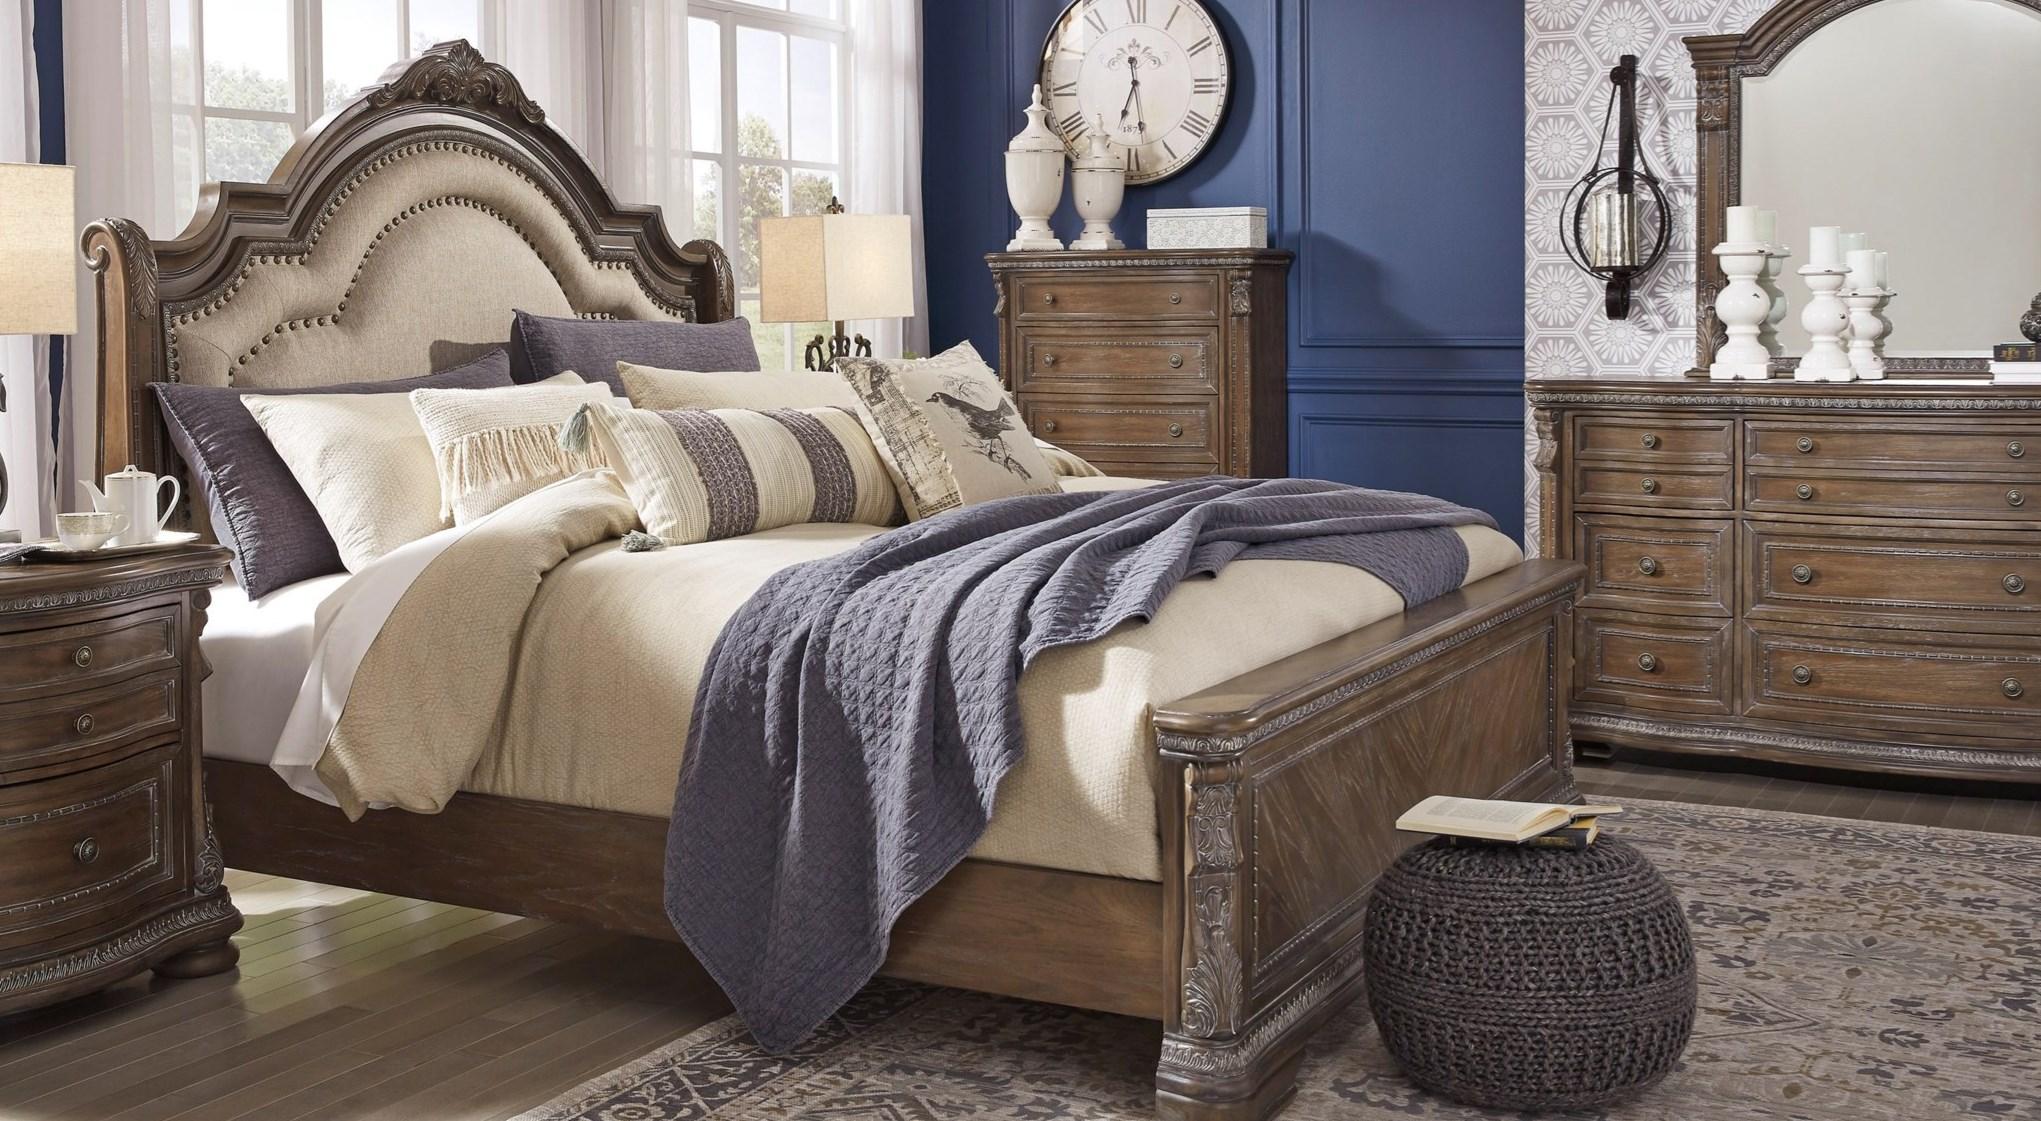 Bedroom Furniture Ruby Gordon Home Rochester Henrietta Greece Monroe County New York Bedroom Furniture Store